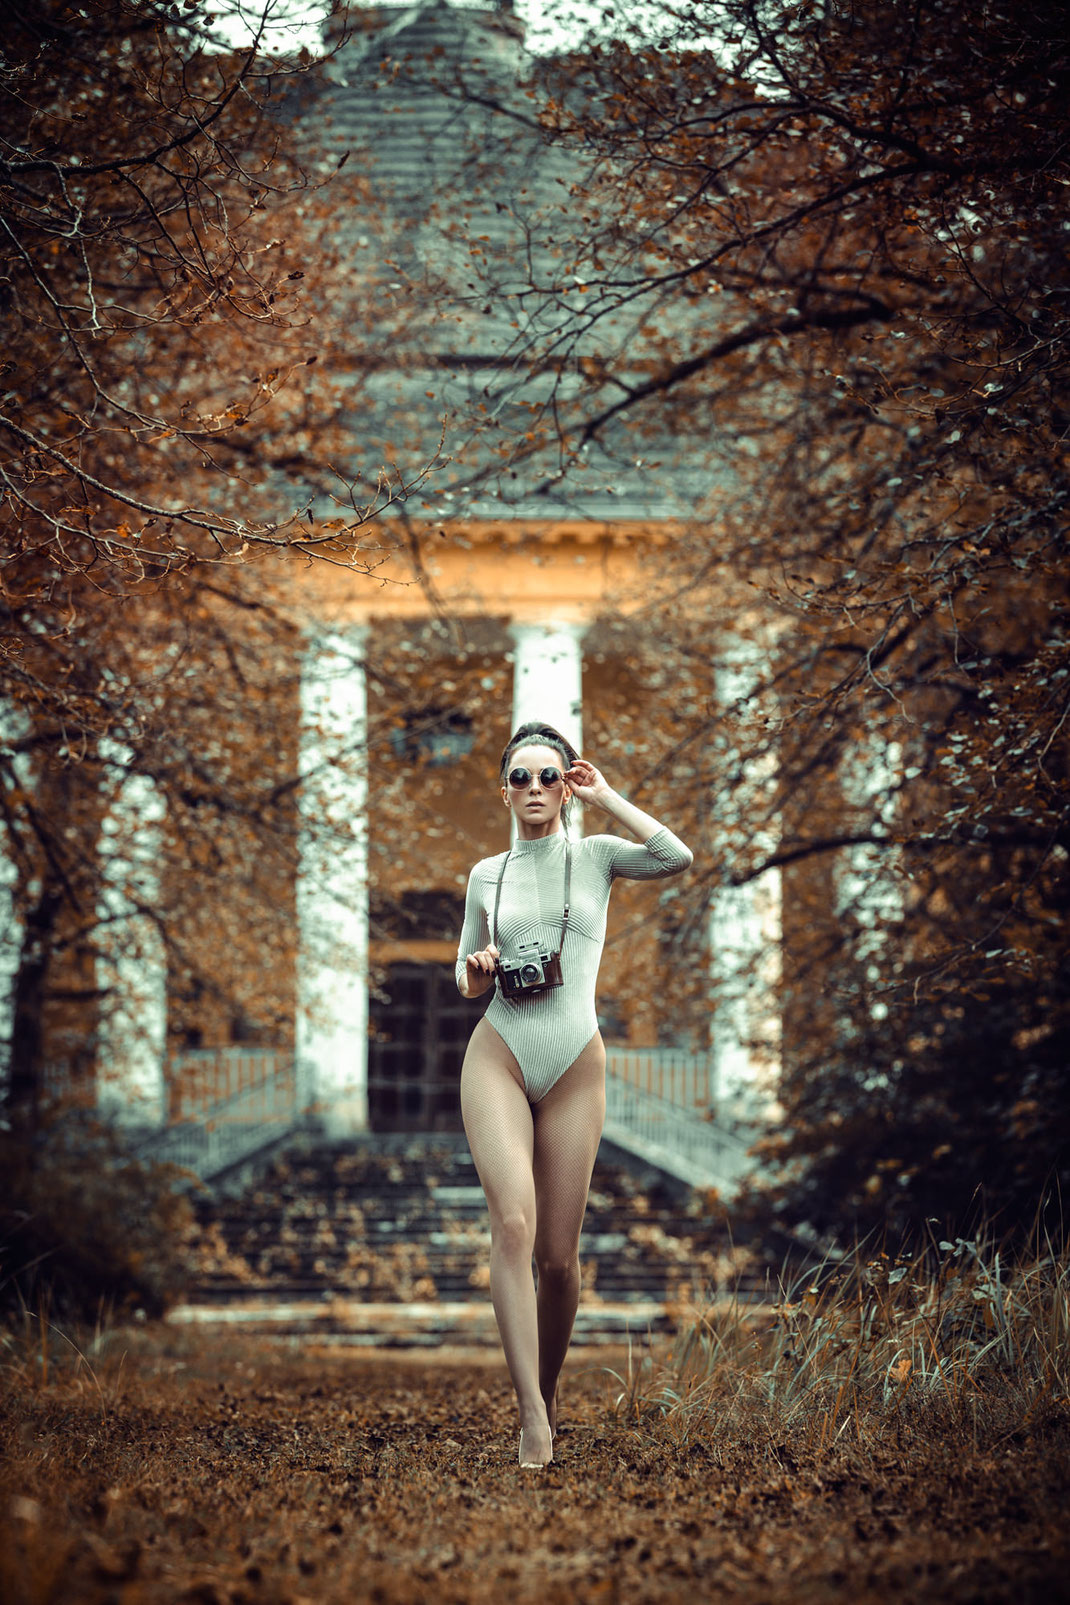 Two Beauties - Angélique & Kiev IV Contax Clone - Markus Hertzsch